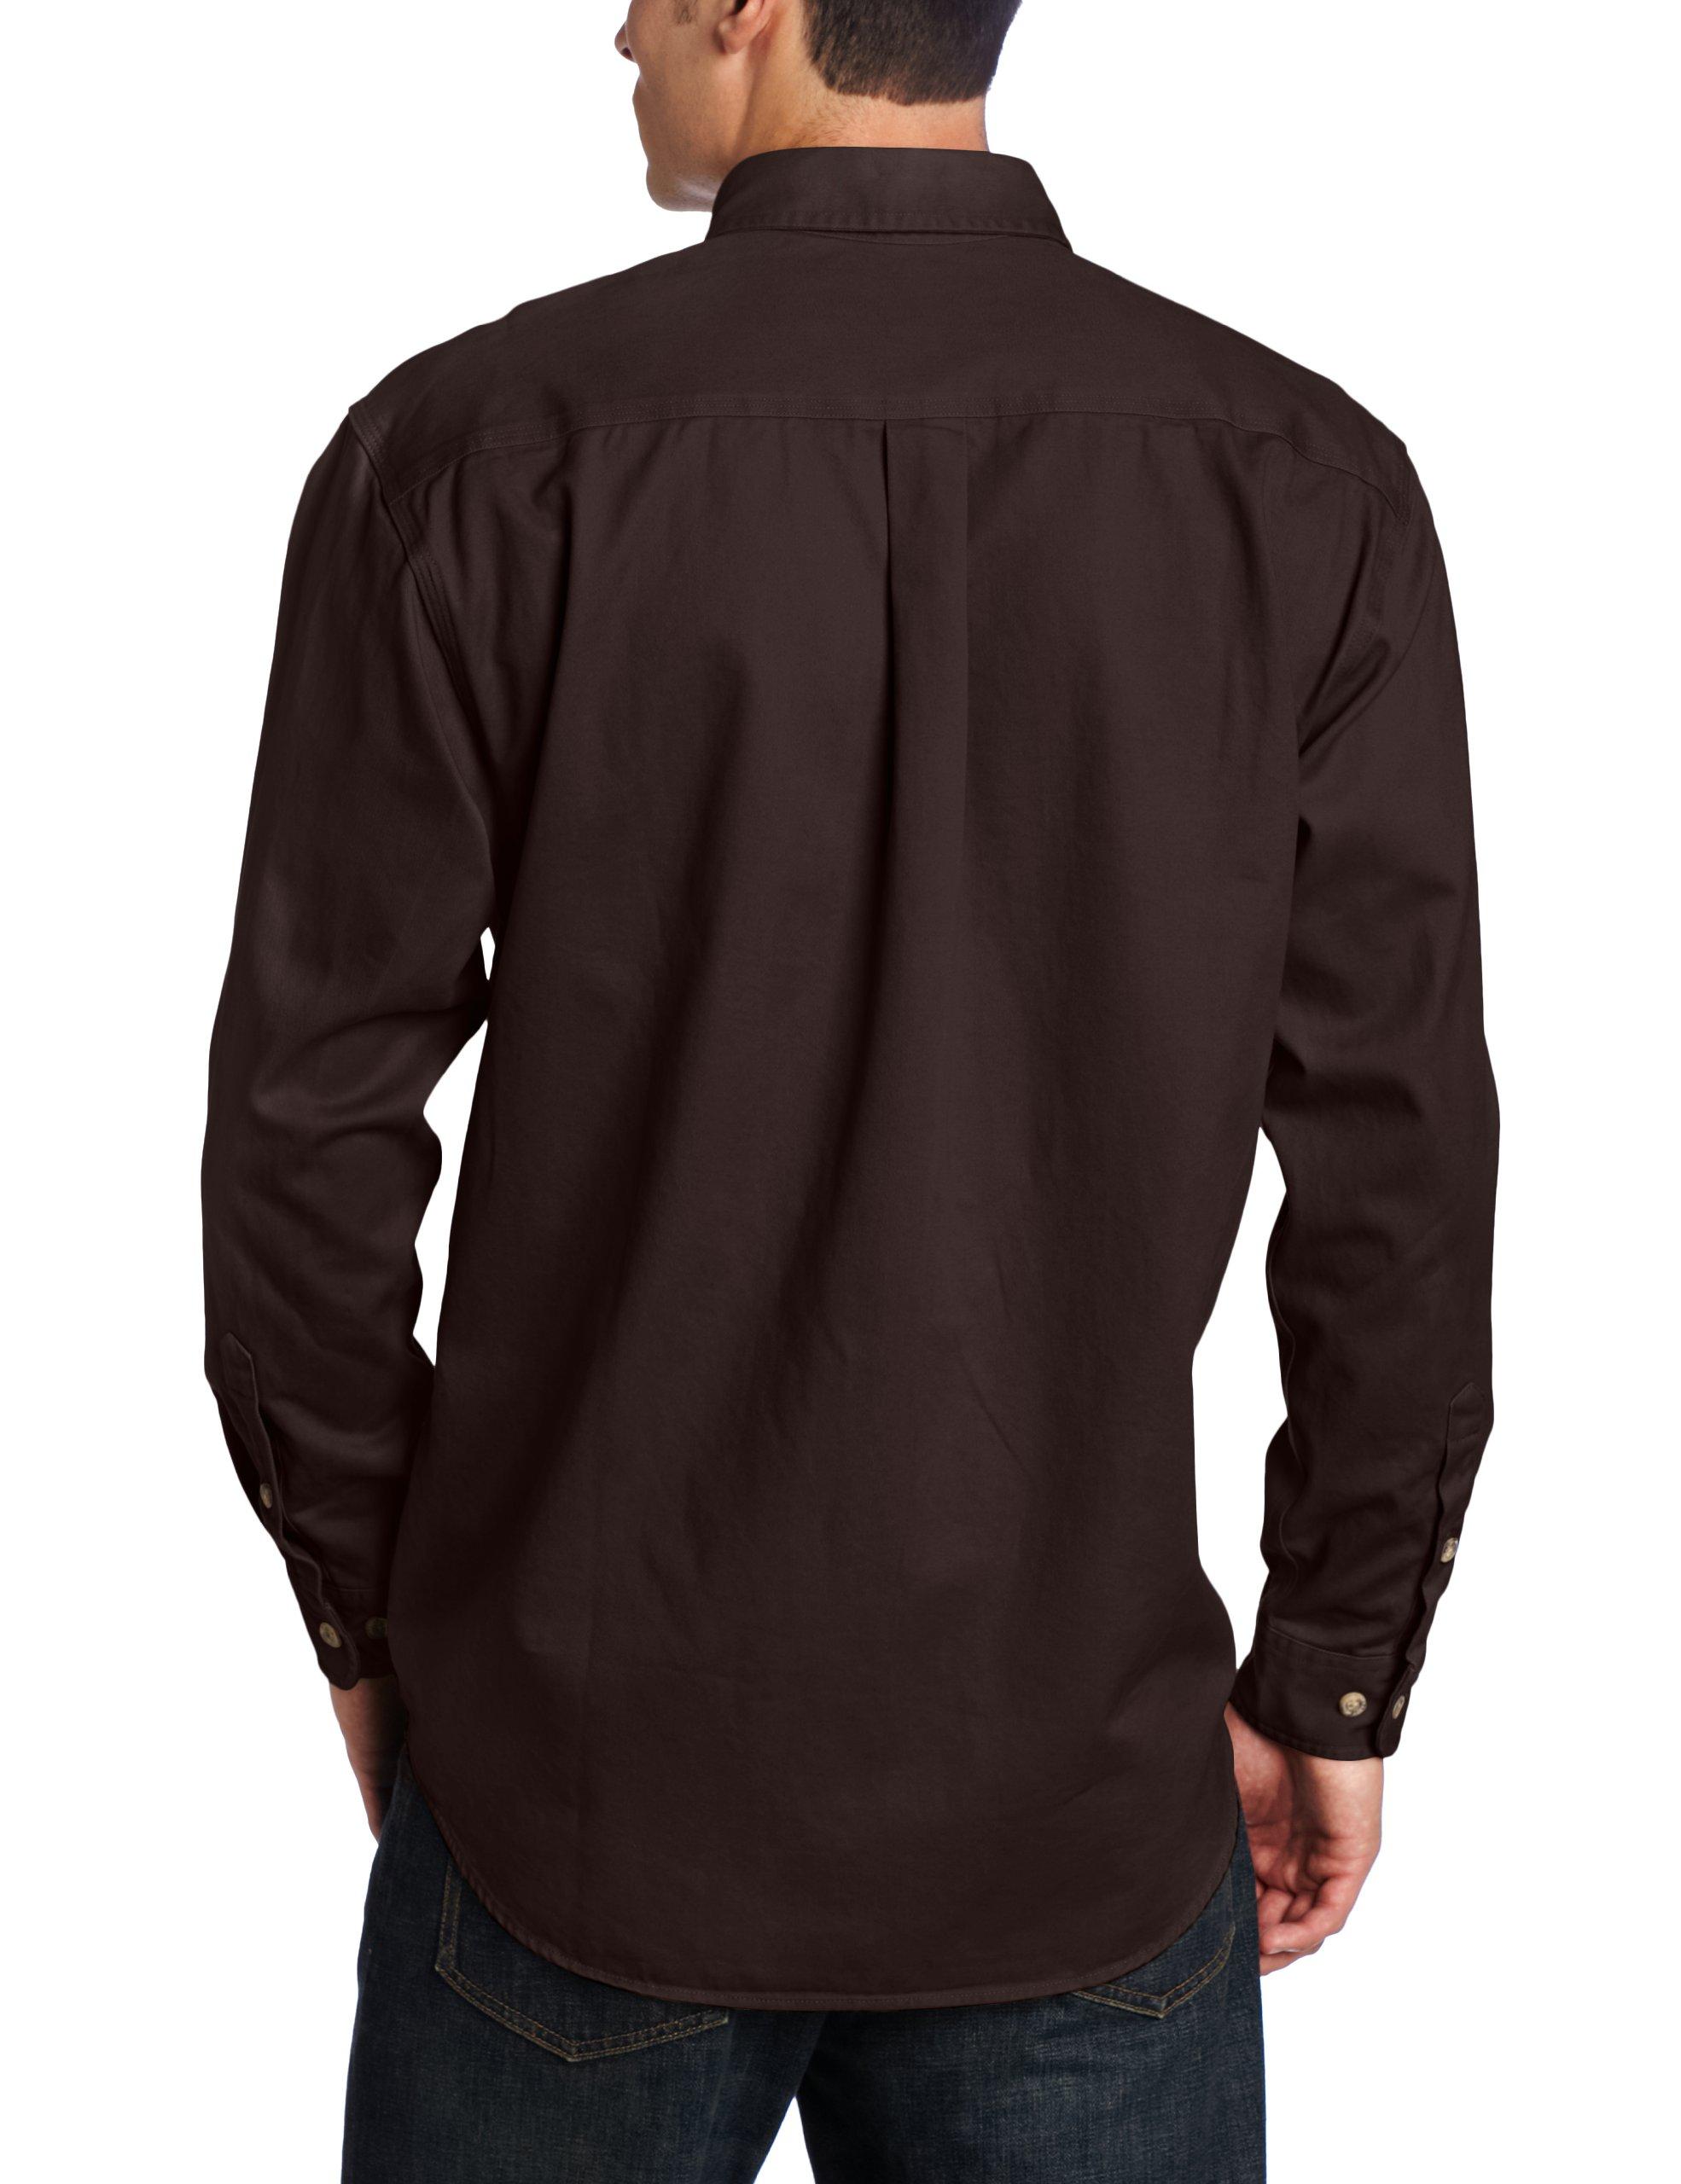 Carhartt Men's Oakman Sandstone Twill Original-Fit Work Shirt, Dark Brown, Regular XX Large by Carhartt (Image #2)